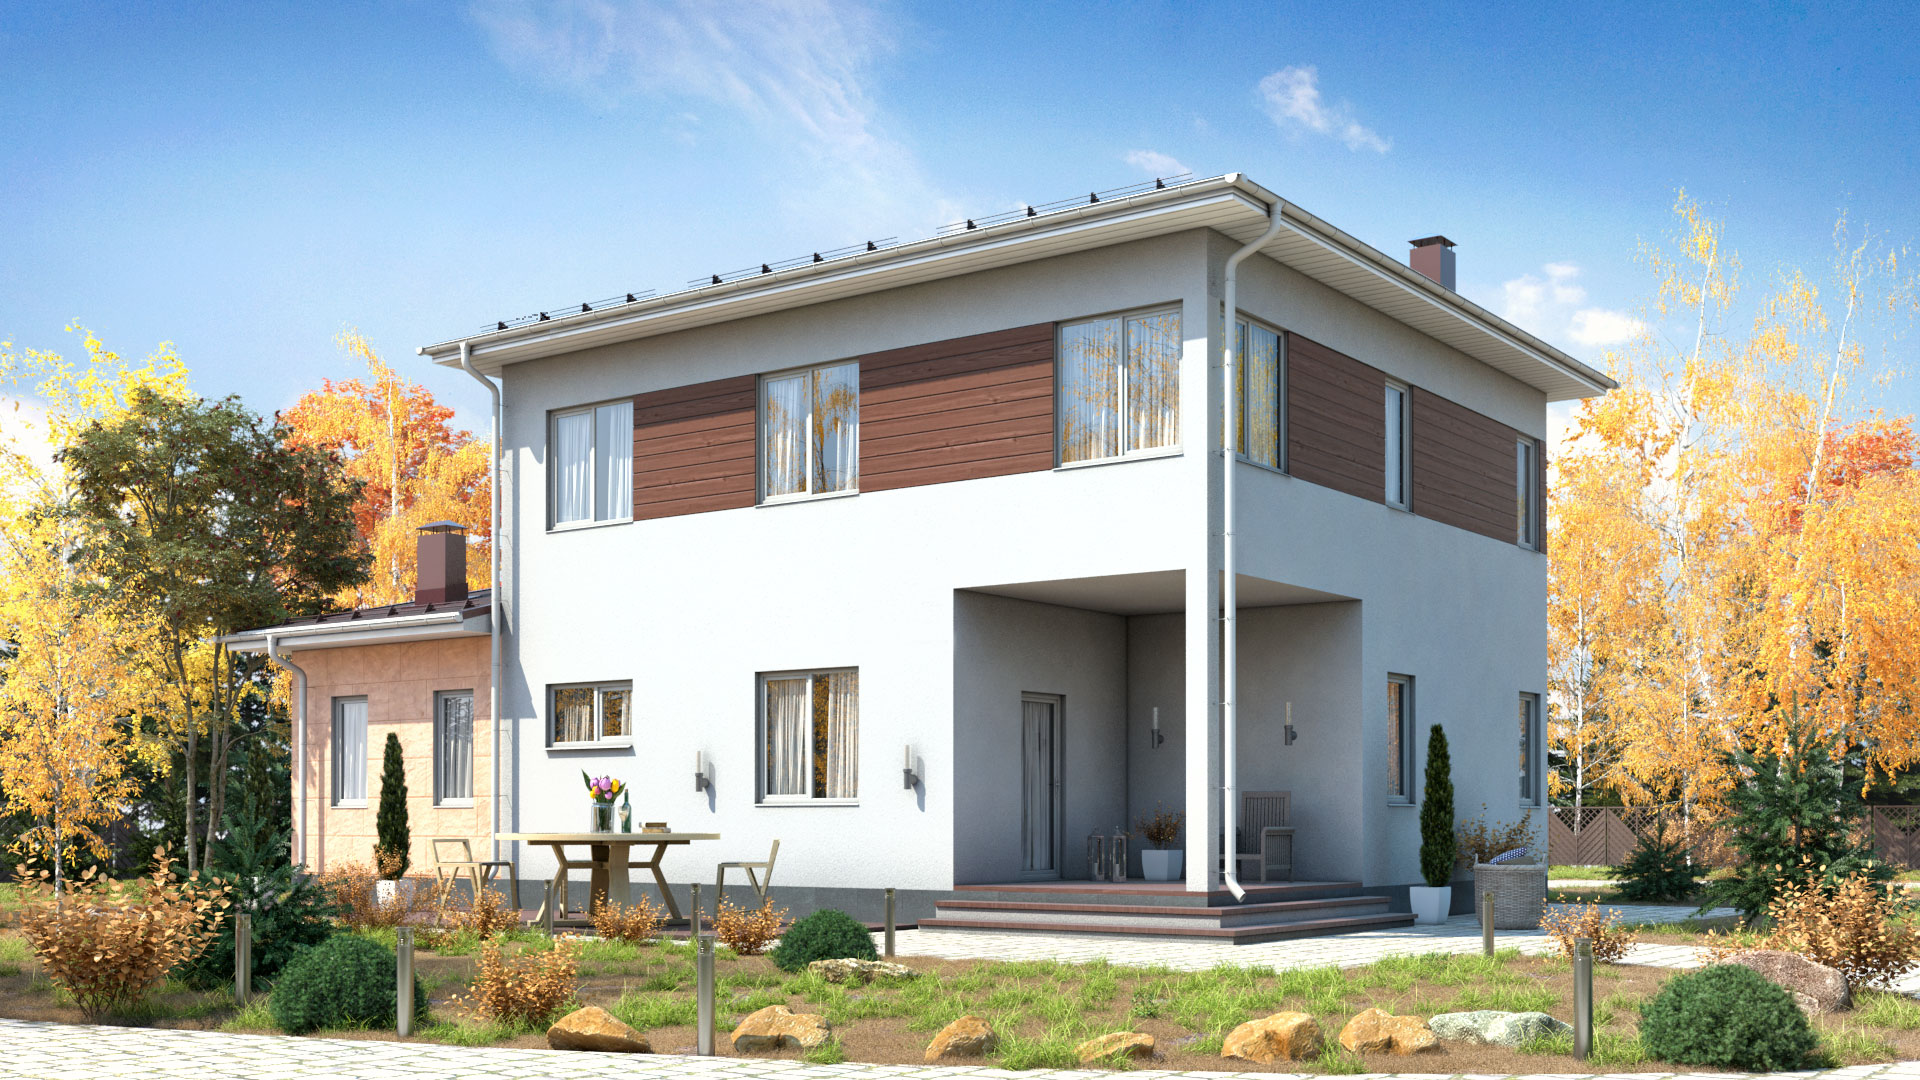 Задний фасад двухэтажного дома БЭНПАН, проект МС-189.